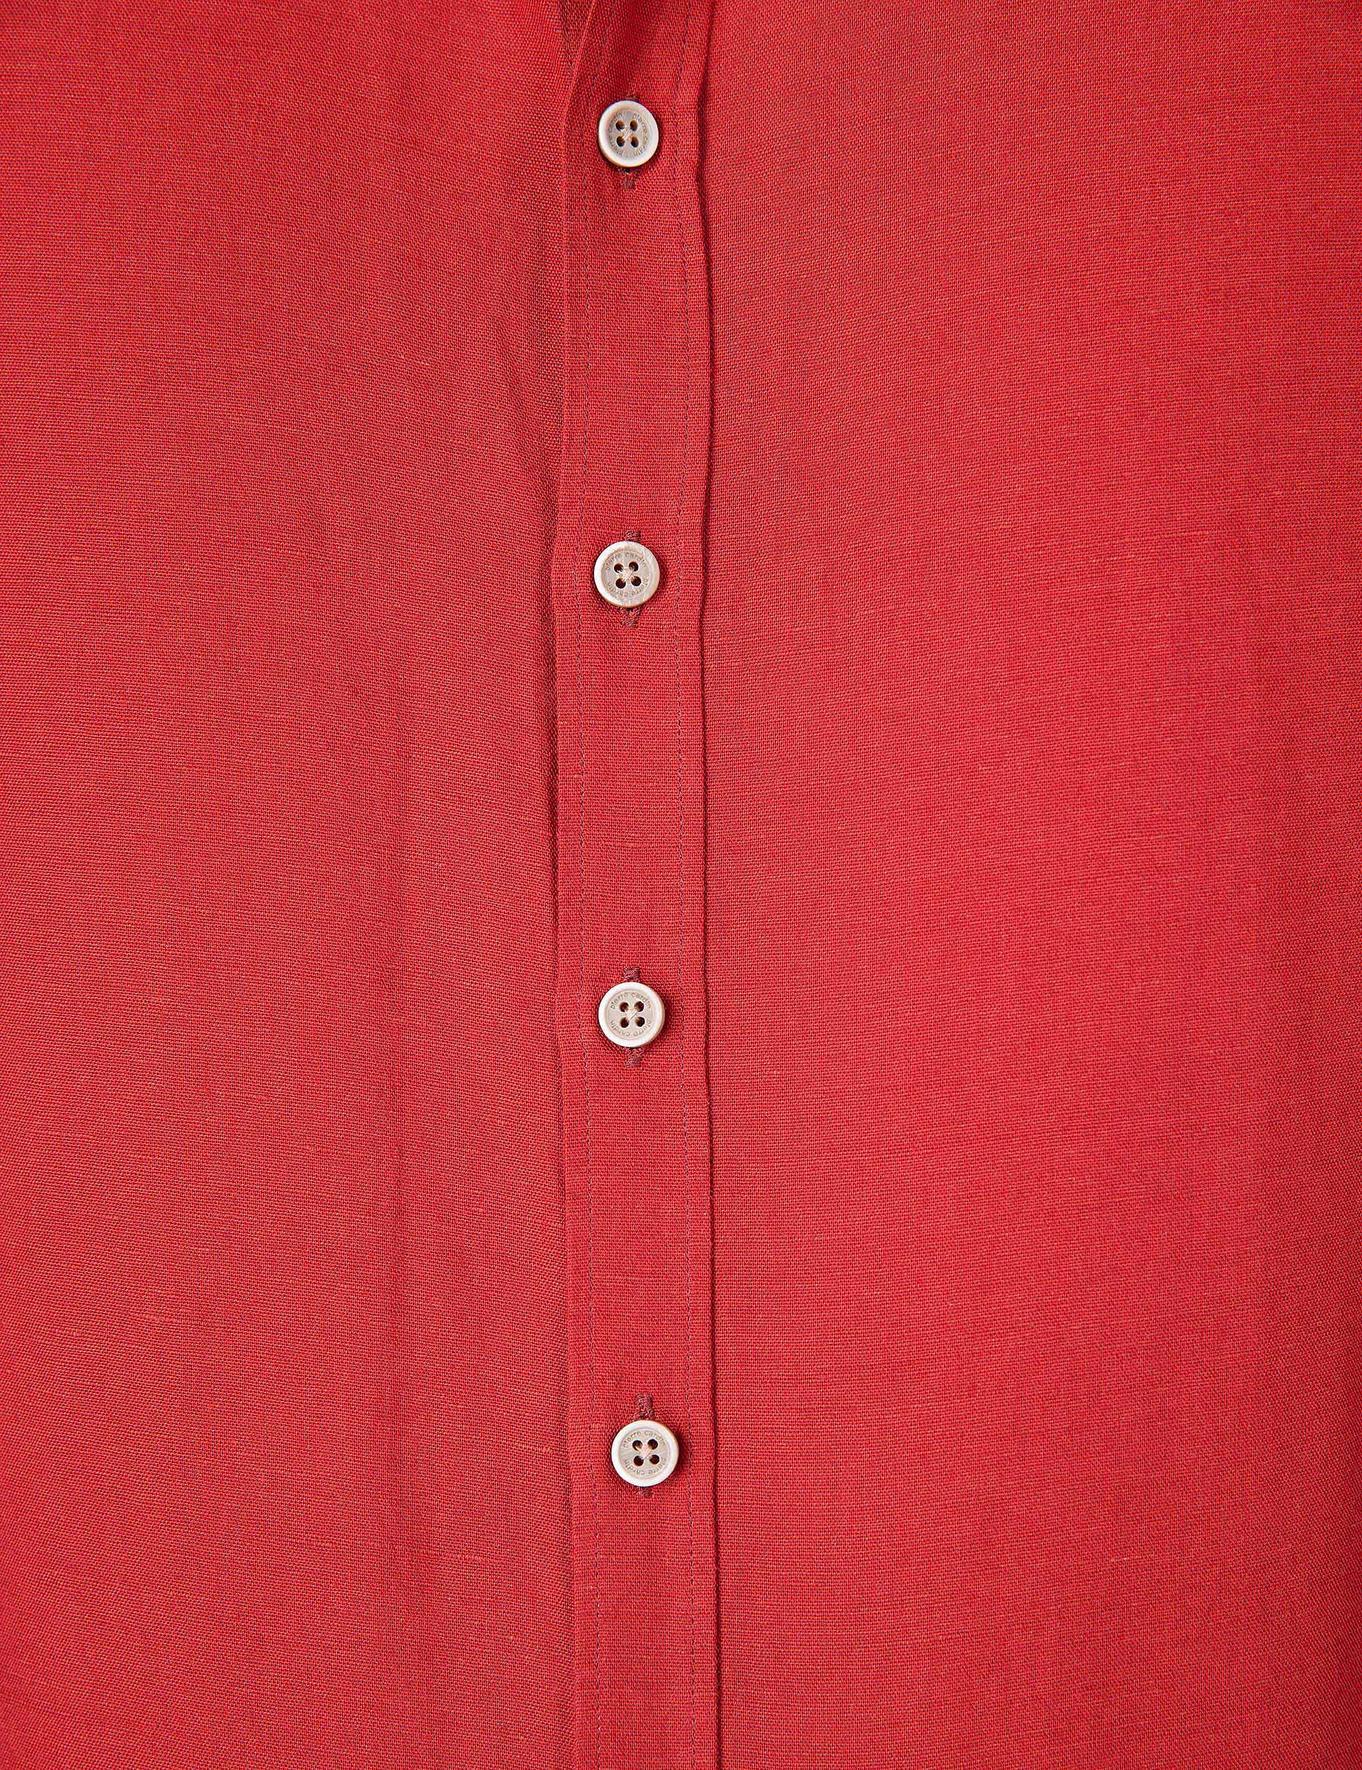 Kiremit Slim Fit Keten Karışımlı Gömlek